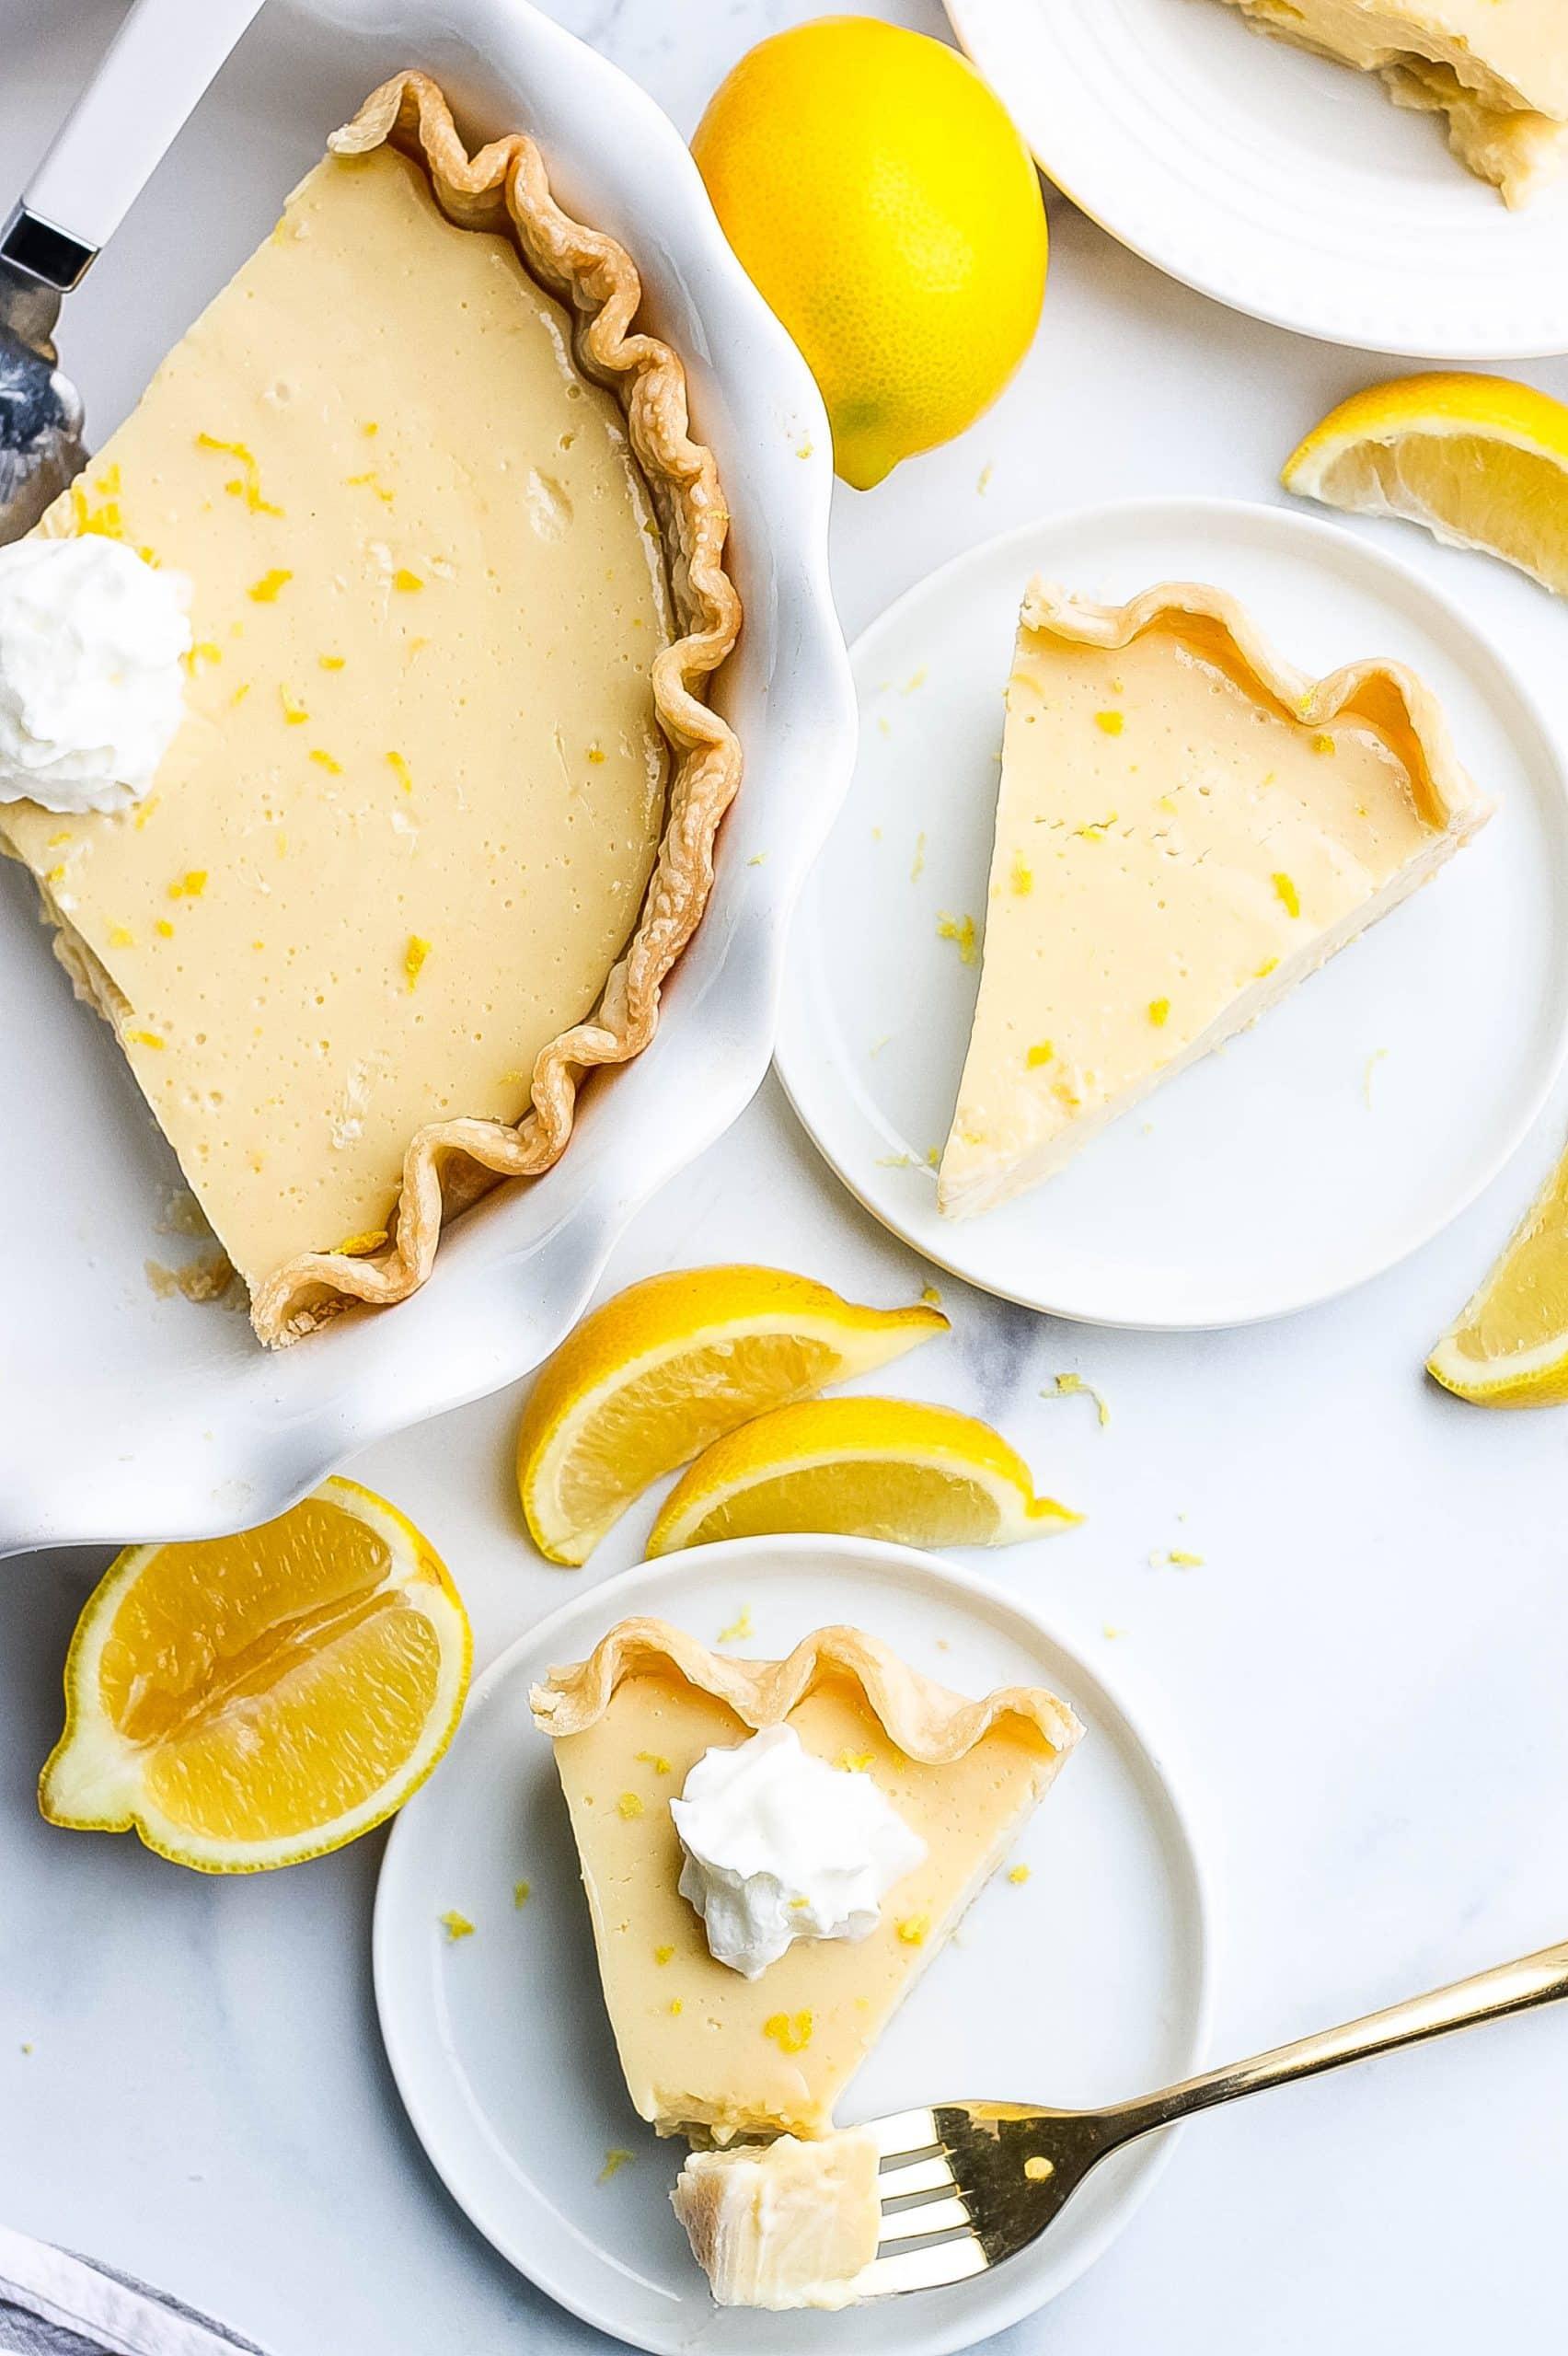 slices of pie and fresh lemons